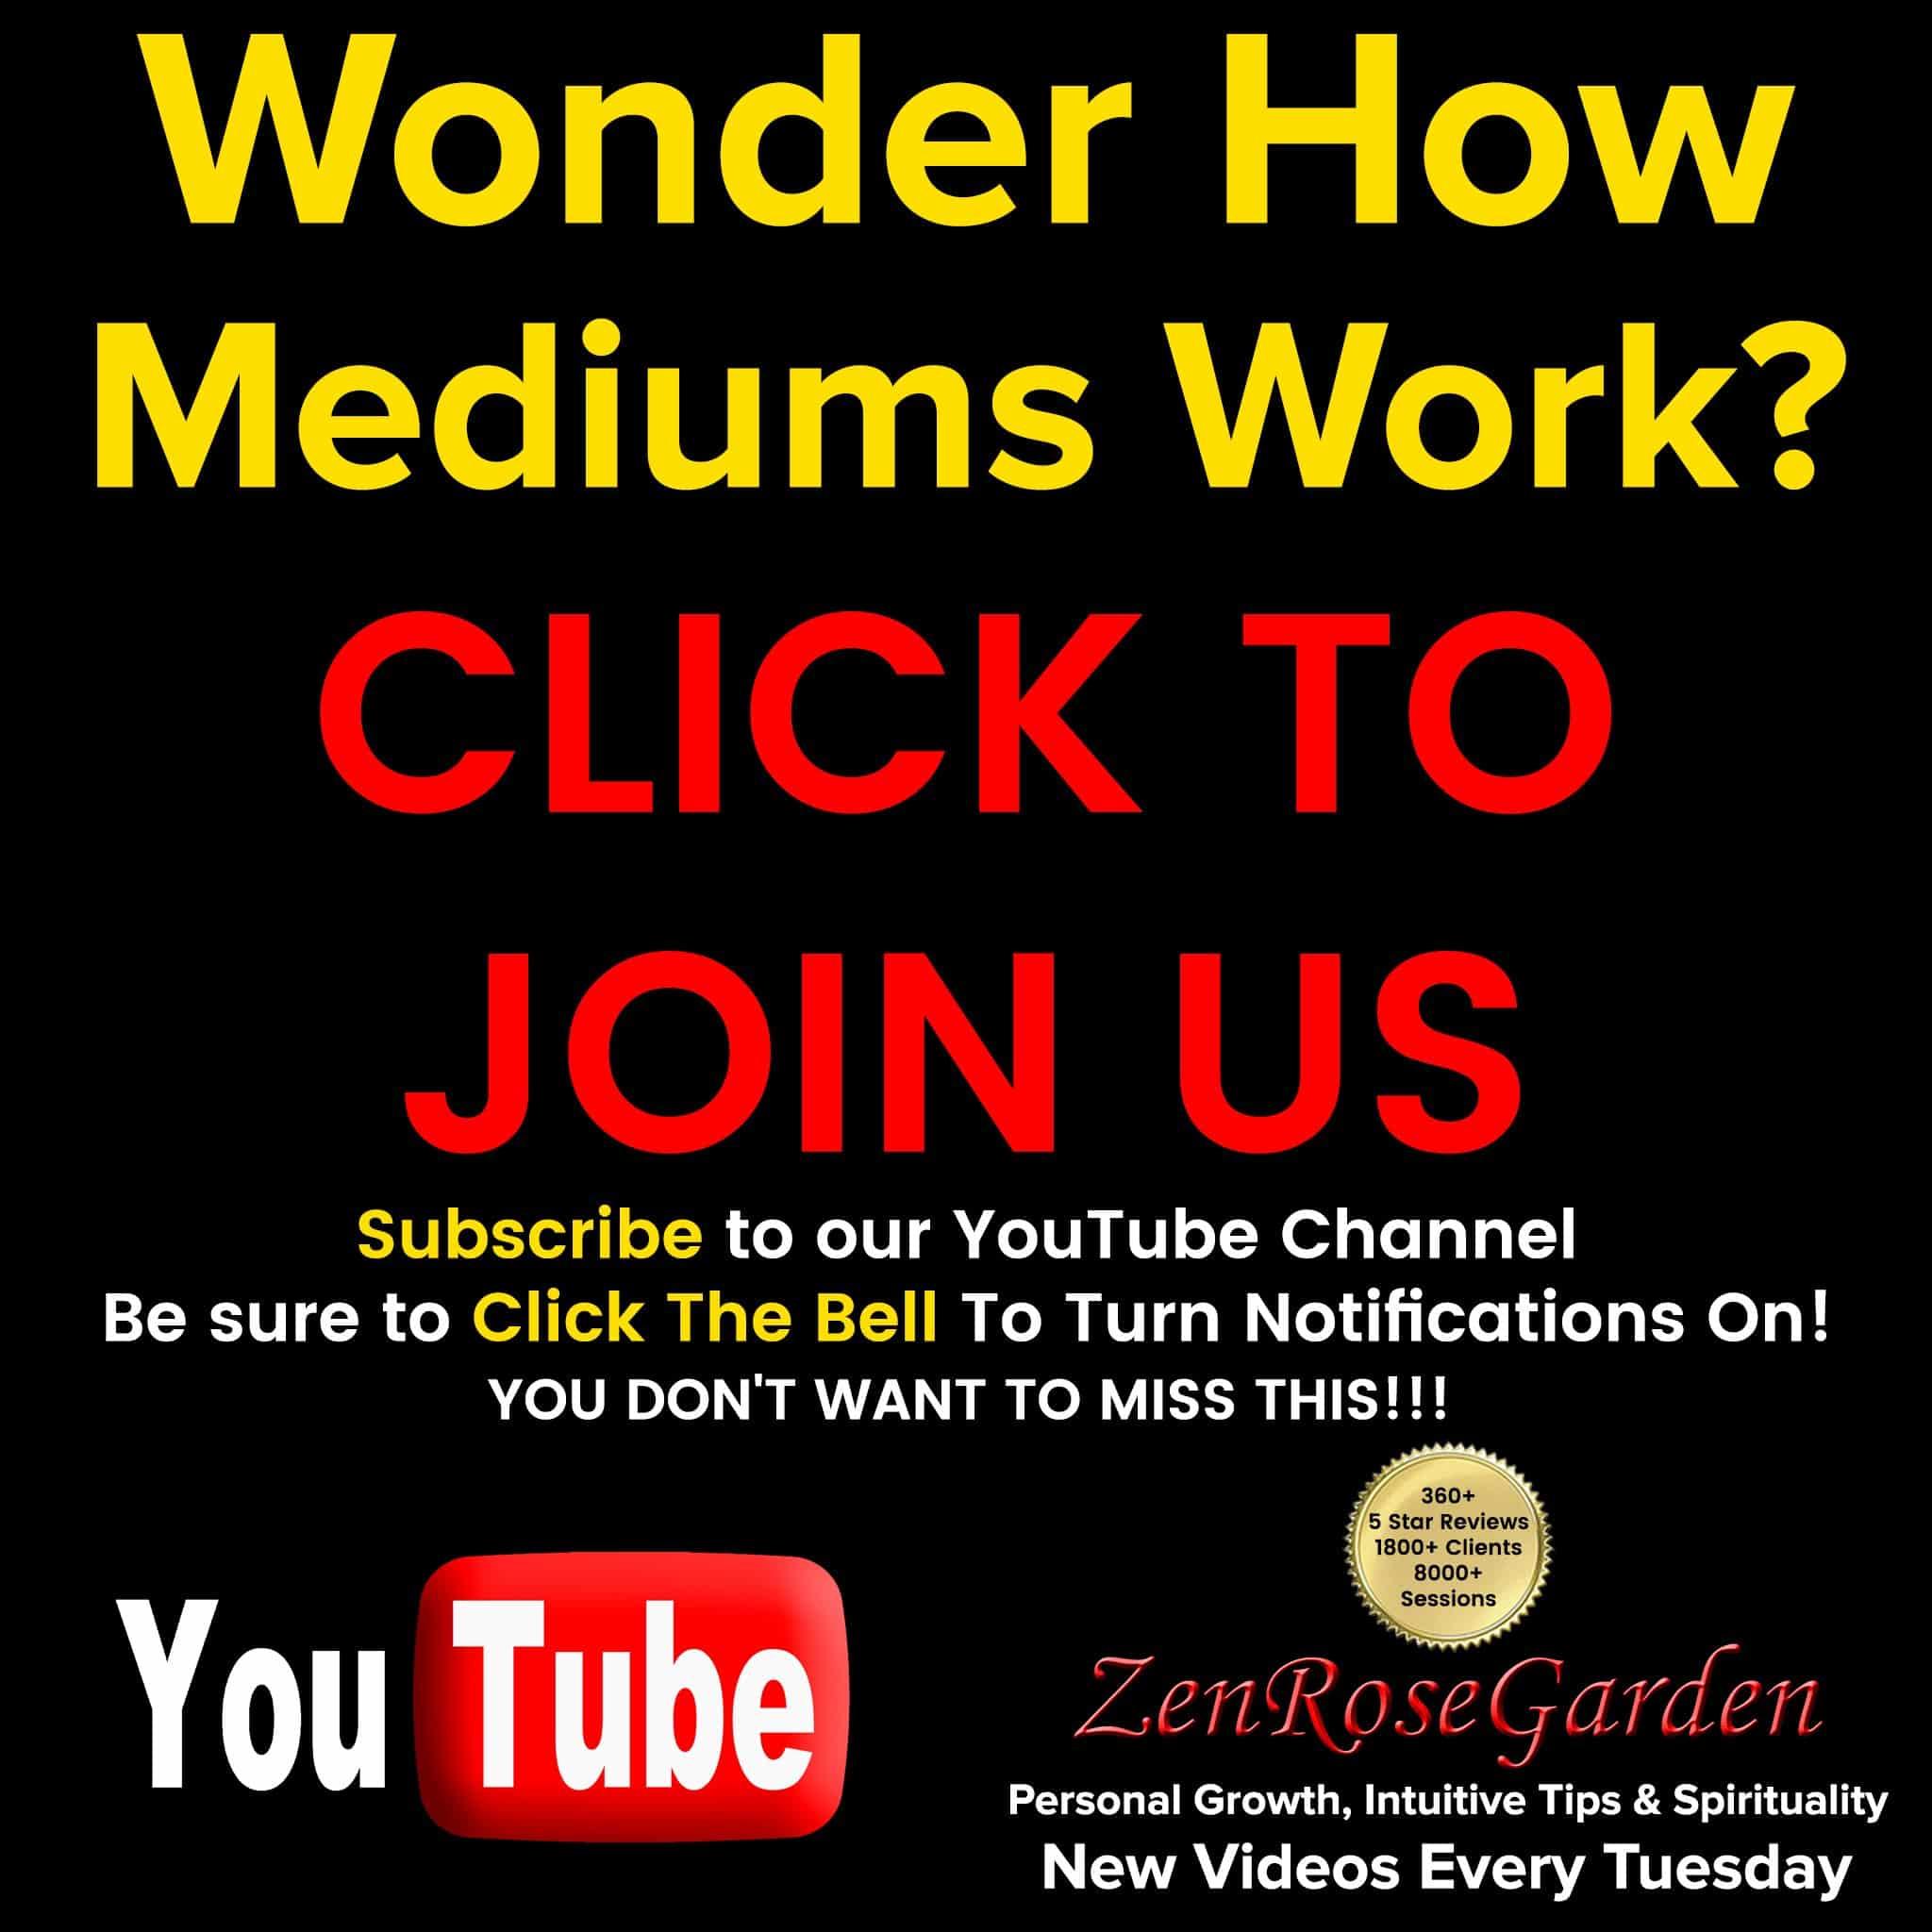 Mediumship Training How Do Mediums Work, Mediumship Training, How Do Mediums Work, mediumship, how to be psychic, intuition, trust your intuition, developing intuition, psychic dreams, psychic protection, spiritual awakening, spiritual gifts, psychic powers, psychic abilities, psychic development, spiritual symbols, what is a psychic medium, how do mediums work, spiritual healing, spiritualism, what is a medium, spirit world, spirit realm, spiritual guidance, spirit possession, spirit guardians, how to communicate with spirits, spirit guides, discernment of spirits, what is a spirit, how to contact spirits, what is a spirit guide, spiritual protection, spiritual messages, spiritual dimensions, Zen Rose Garden,